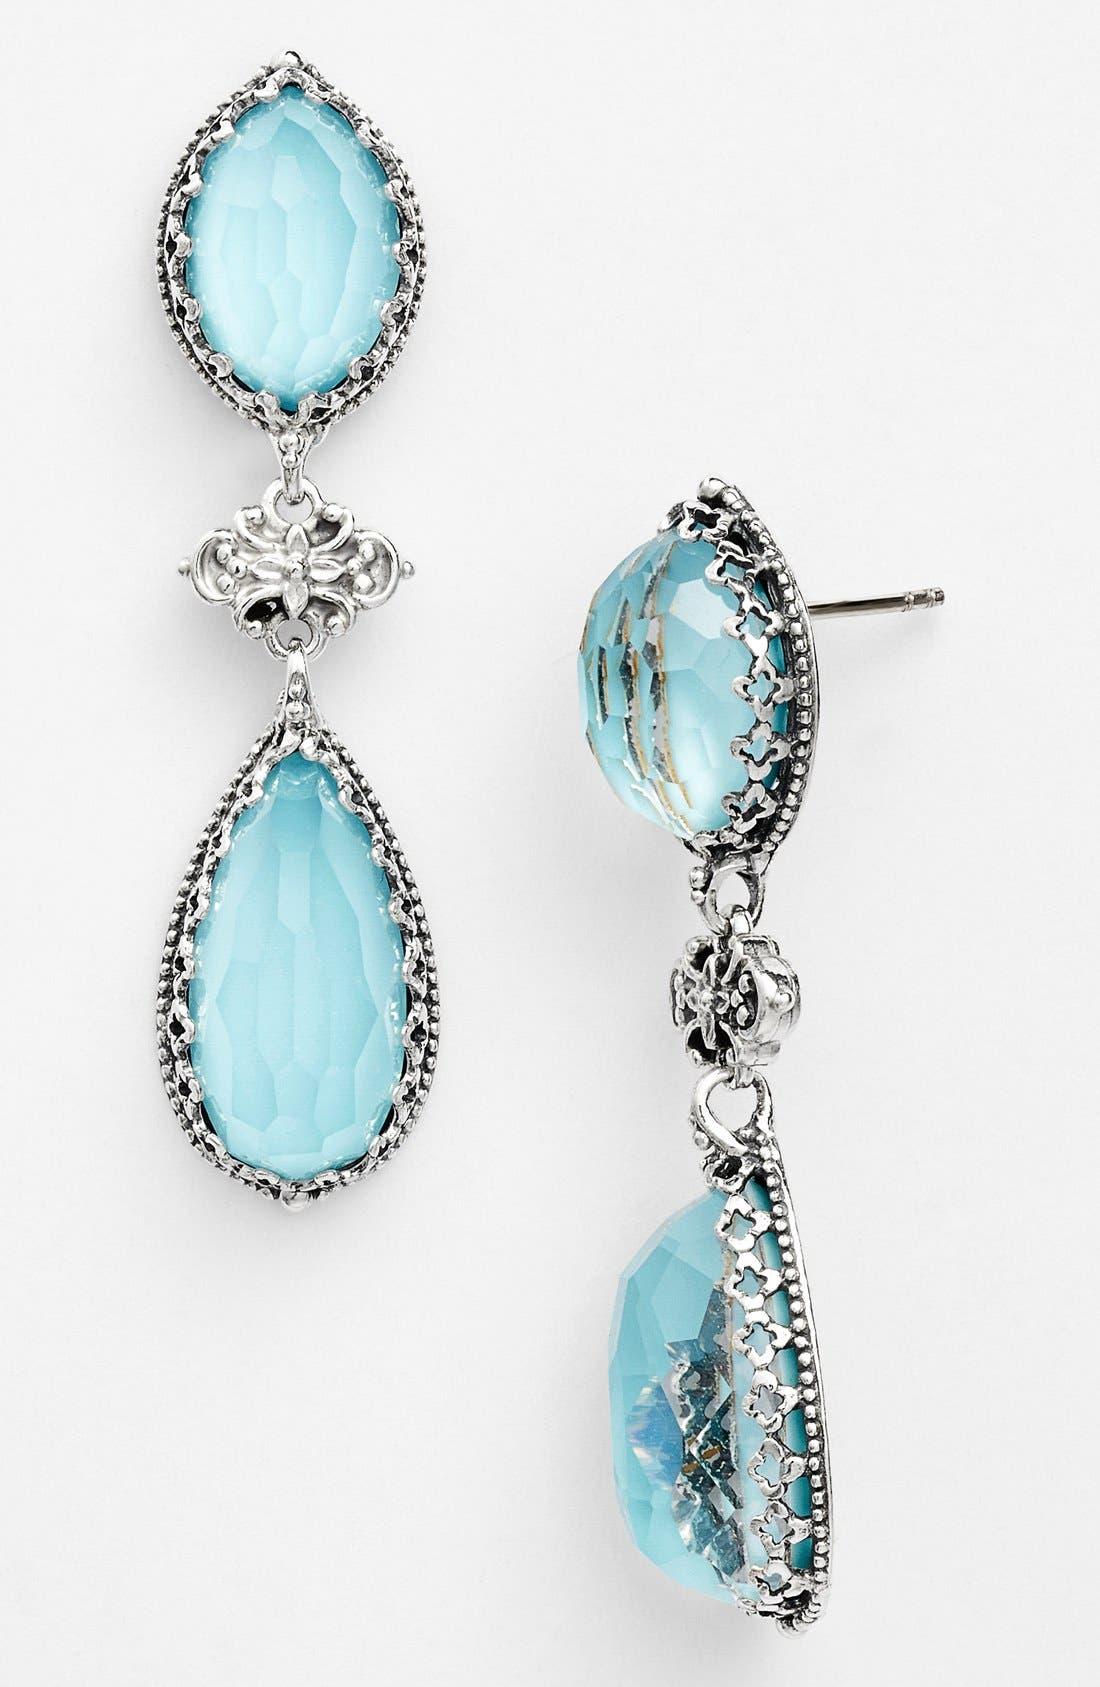 KONSTANTINO 'Aegean' Drop Earrings